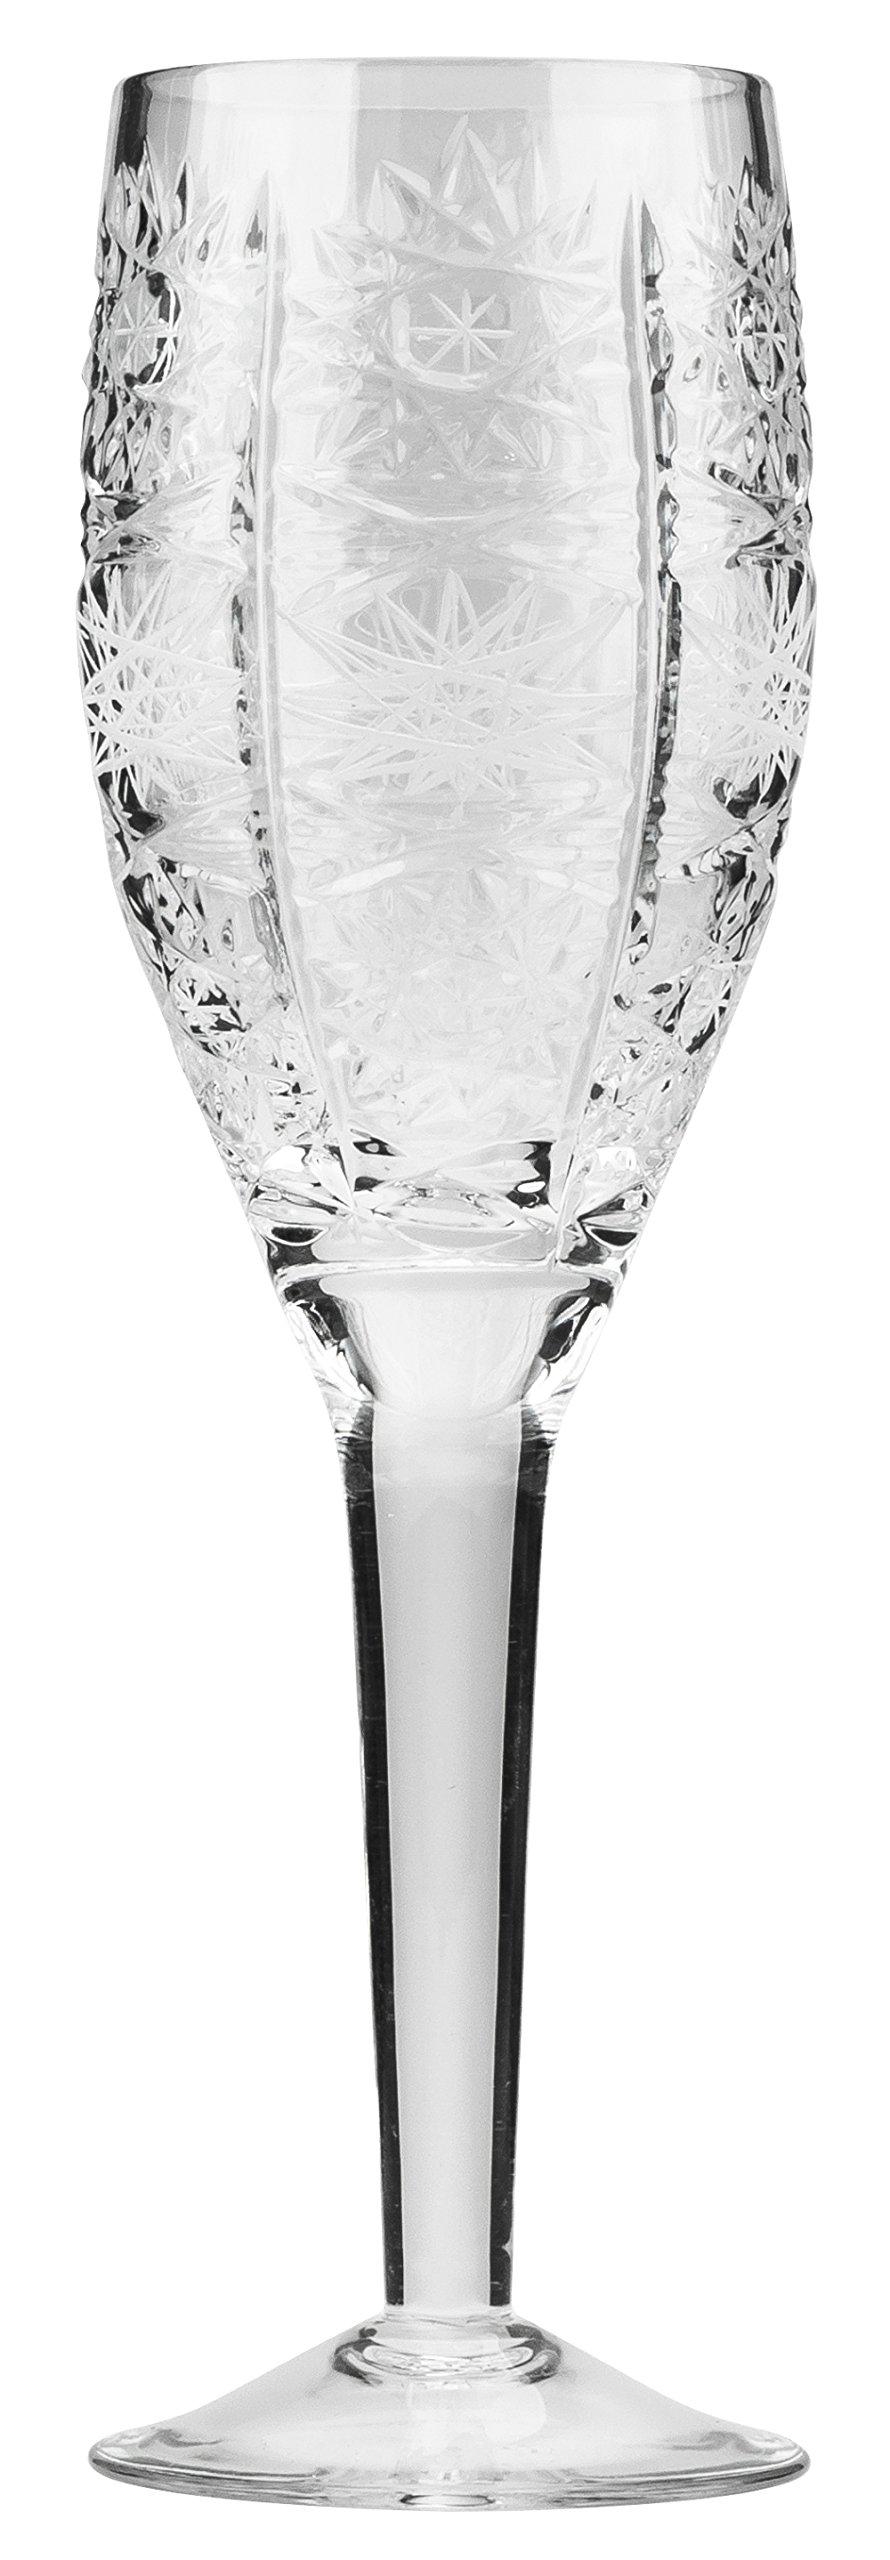 Bohemia Crytal WG7110/11, 2-Oz/60ml Crystal Cut Shot Glasses, Vodka Liquor Handmade Glassware, Vintage Drinkware, Set of 6